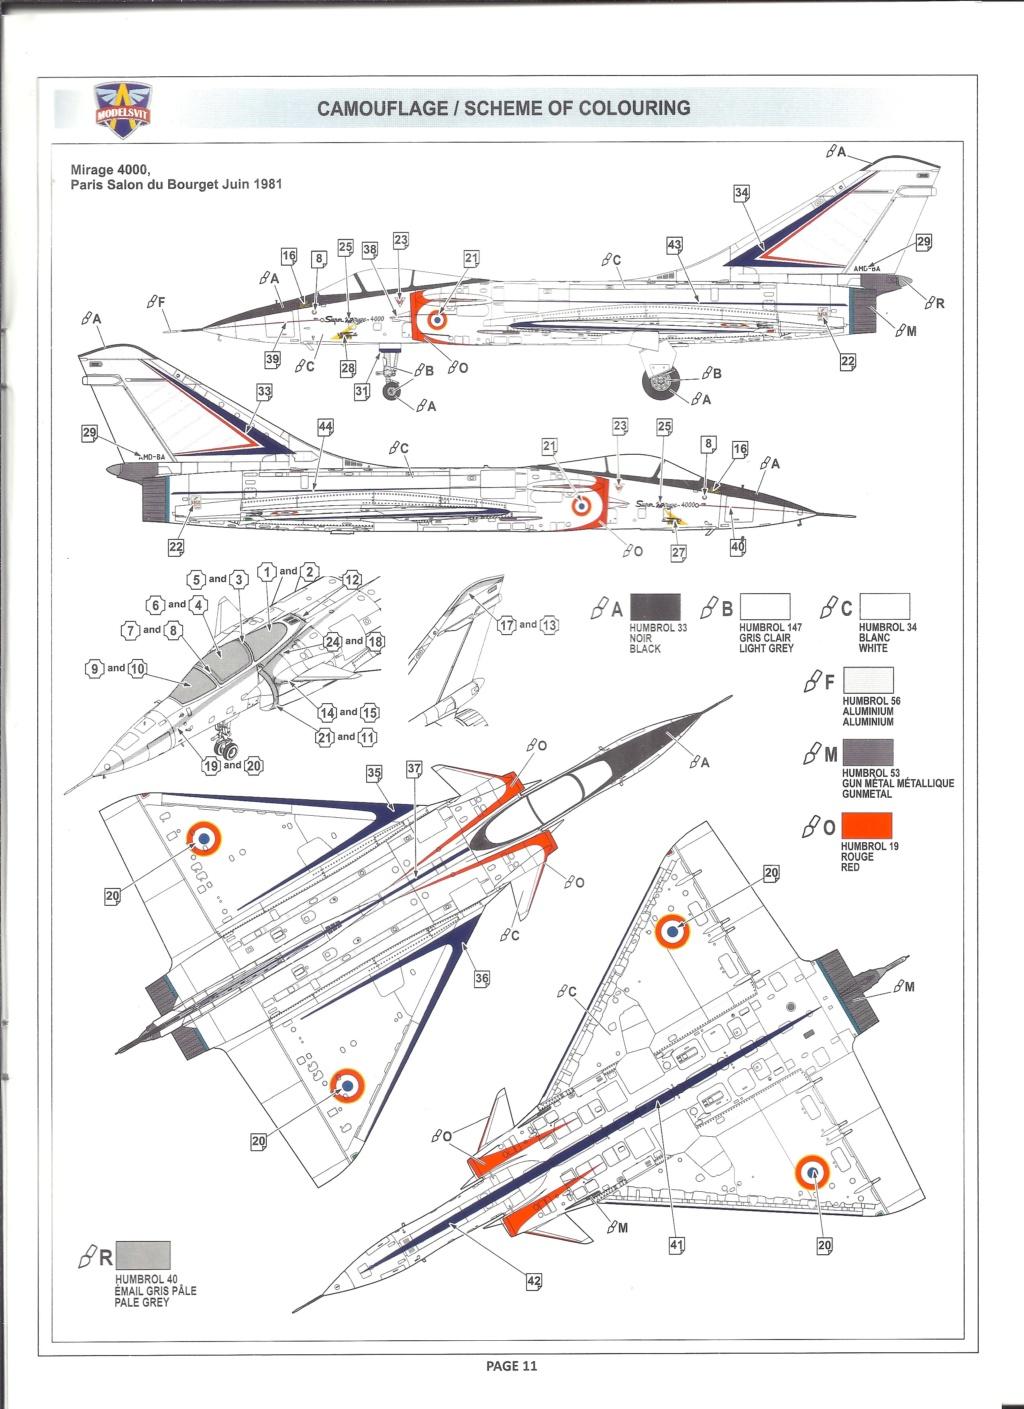 [MODELSVIT] DASSAULT MIRAGE 4000 1/72ème Réf 72052 Notice Models22